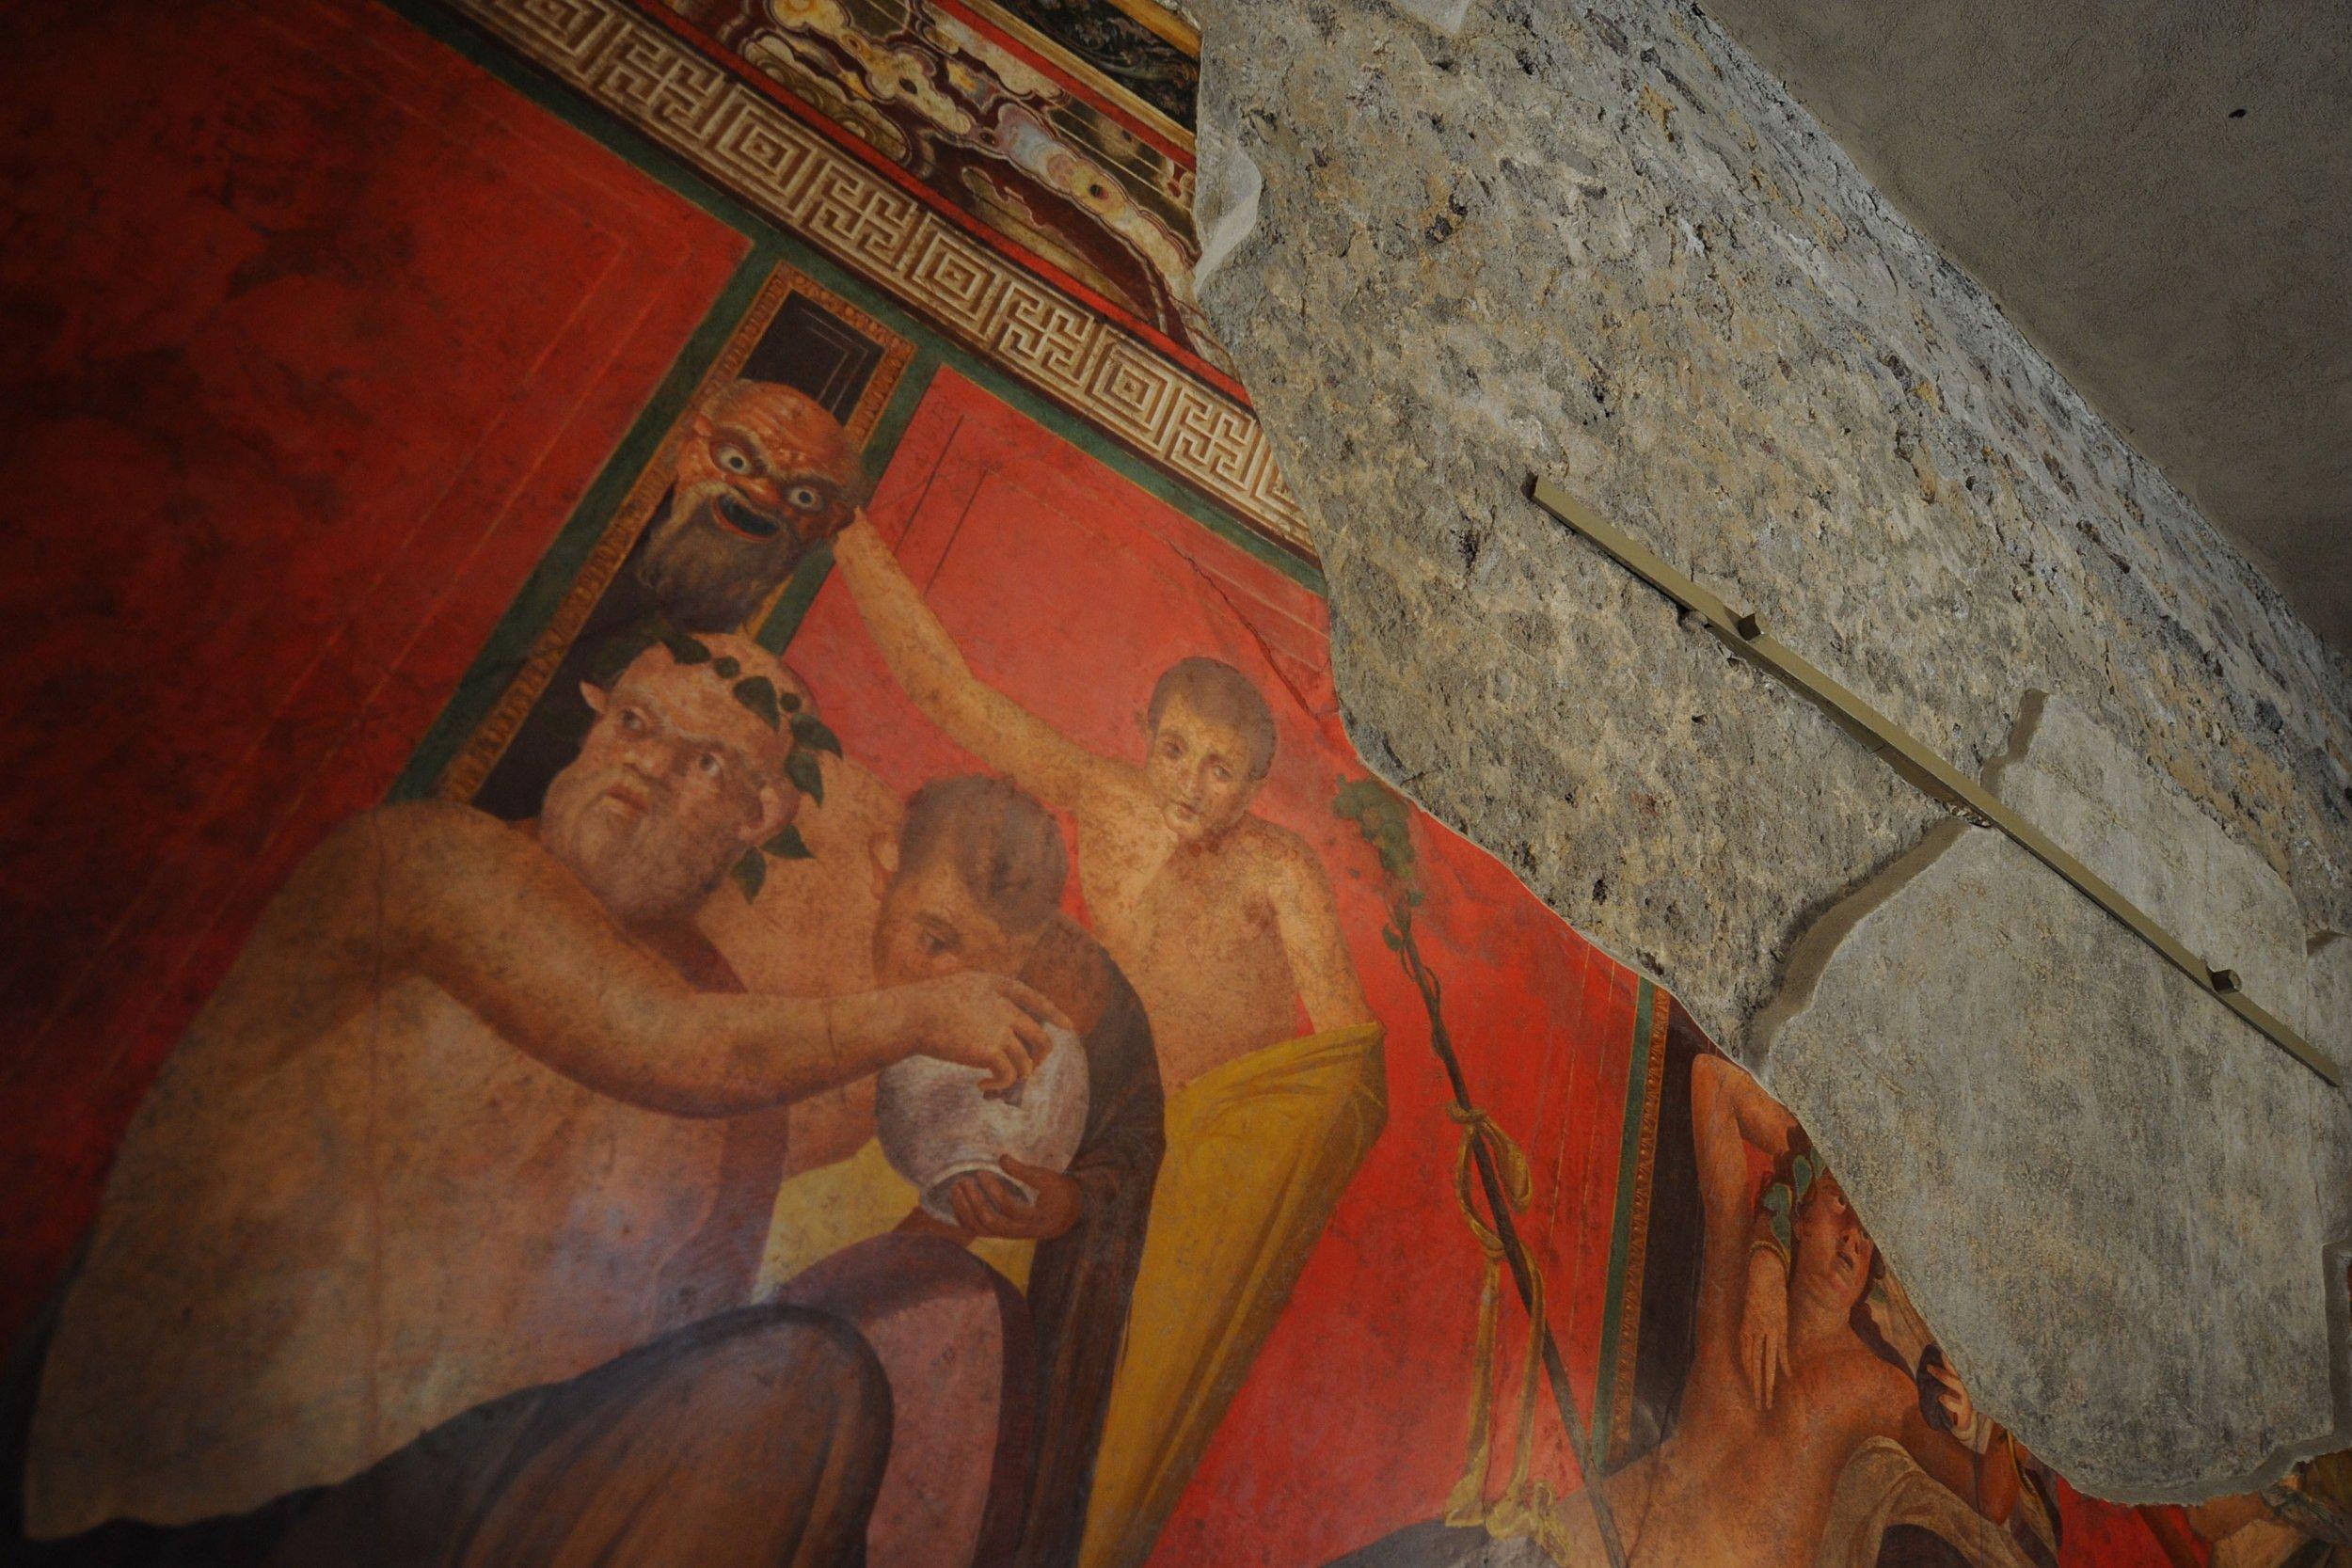 Pompeii Archaeologists Discover Fresco Painting of Roman